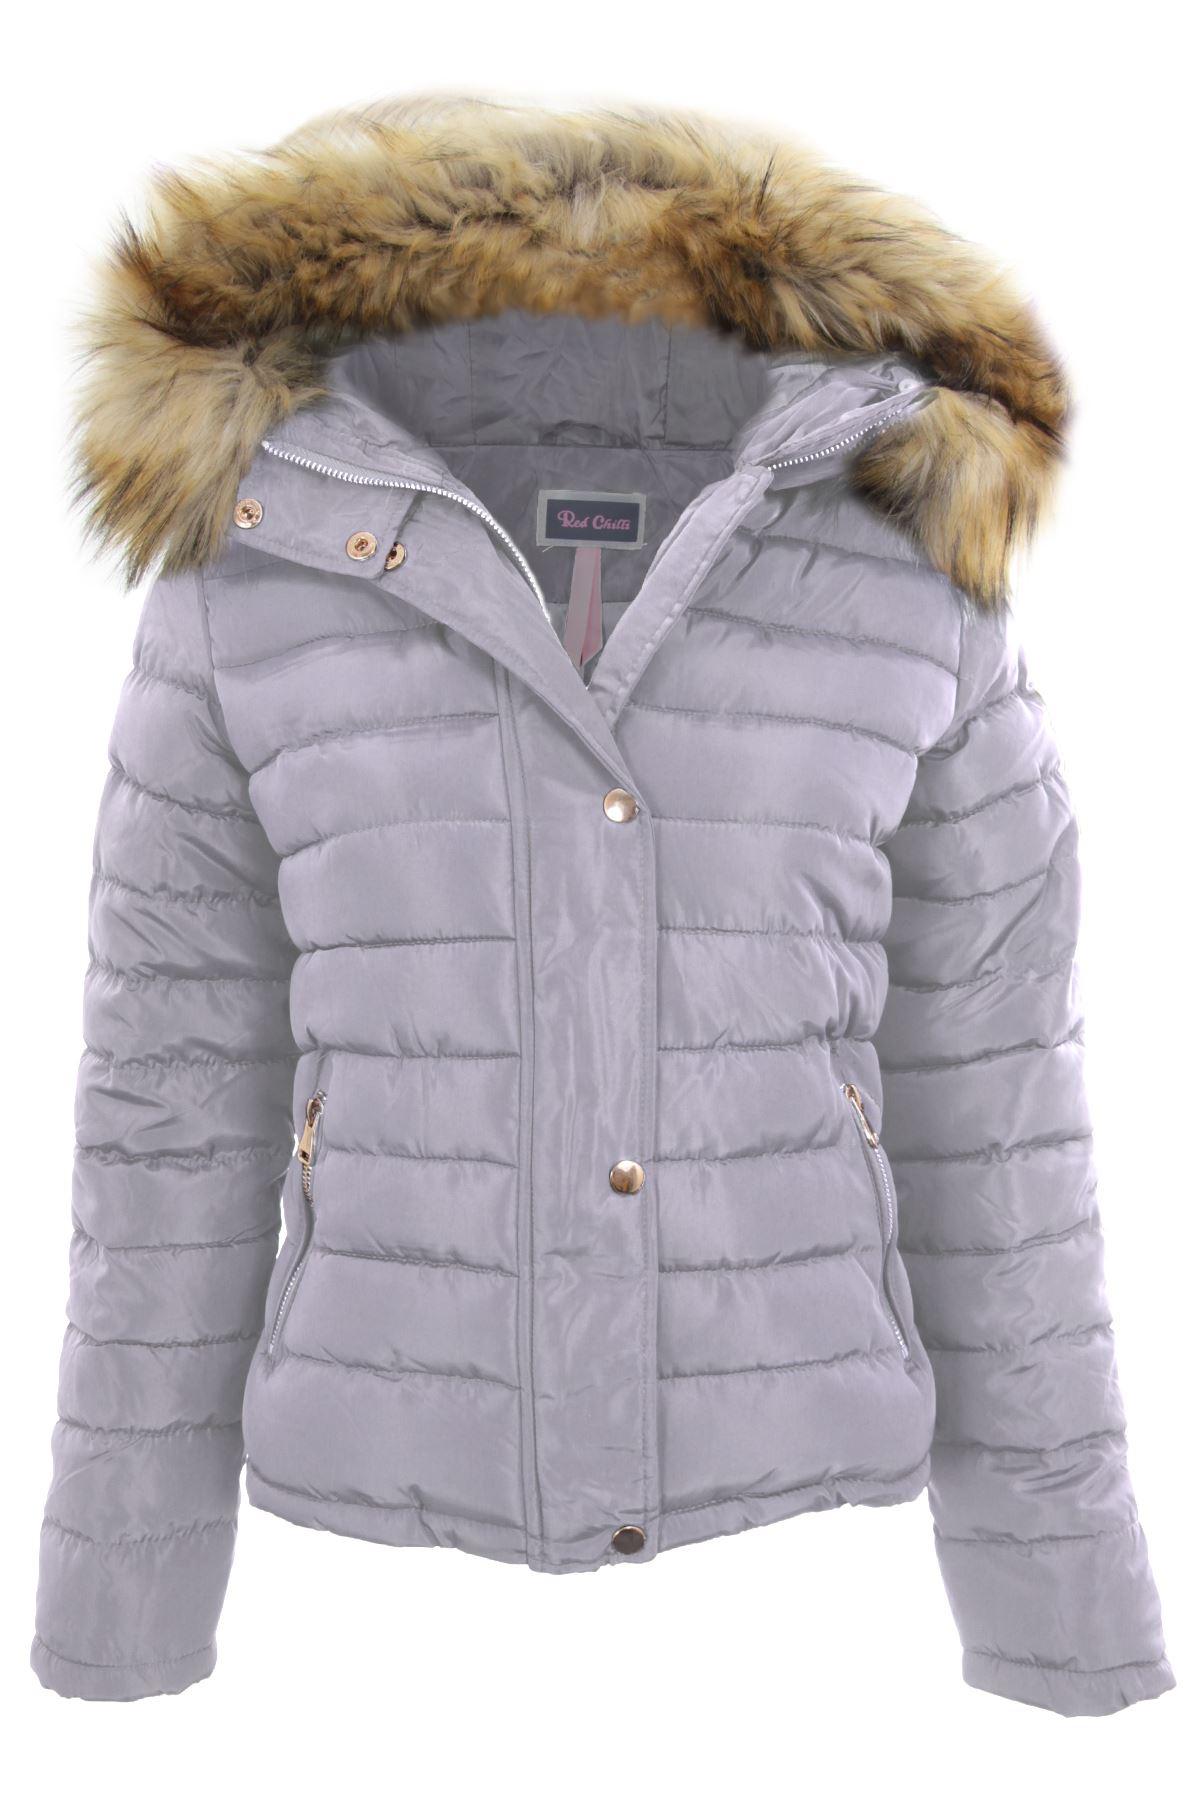 Ladies Detachable Fur Lined Hood Padded Puffer Jacket